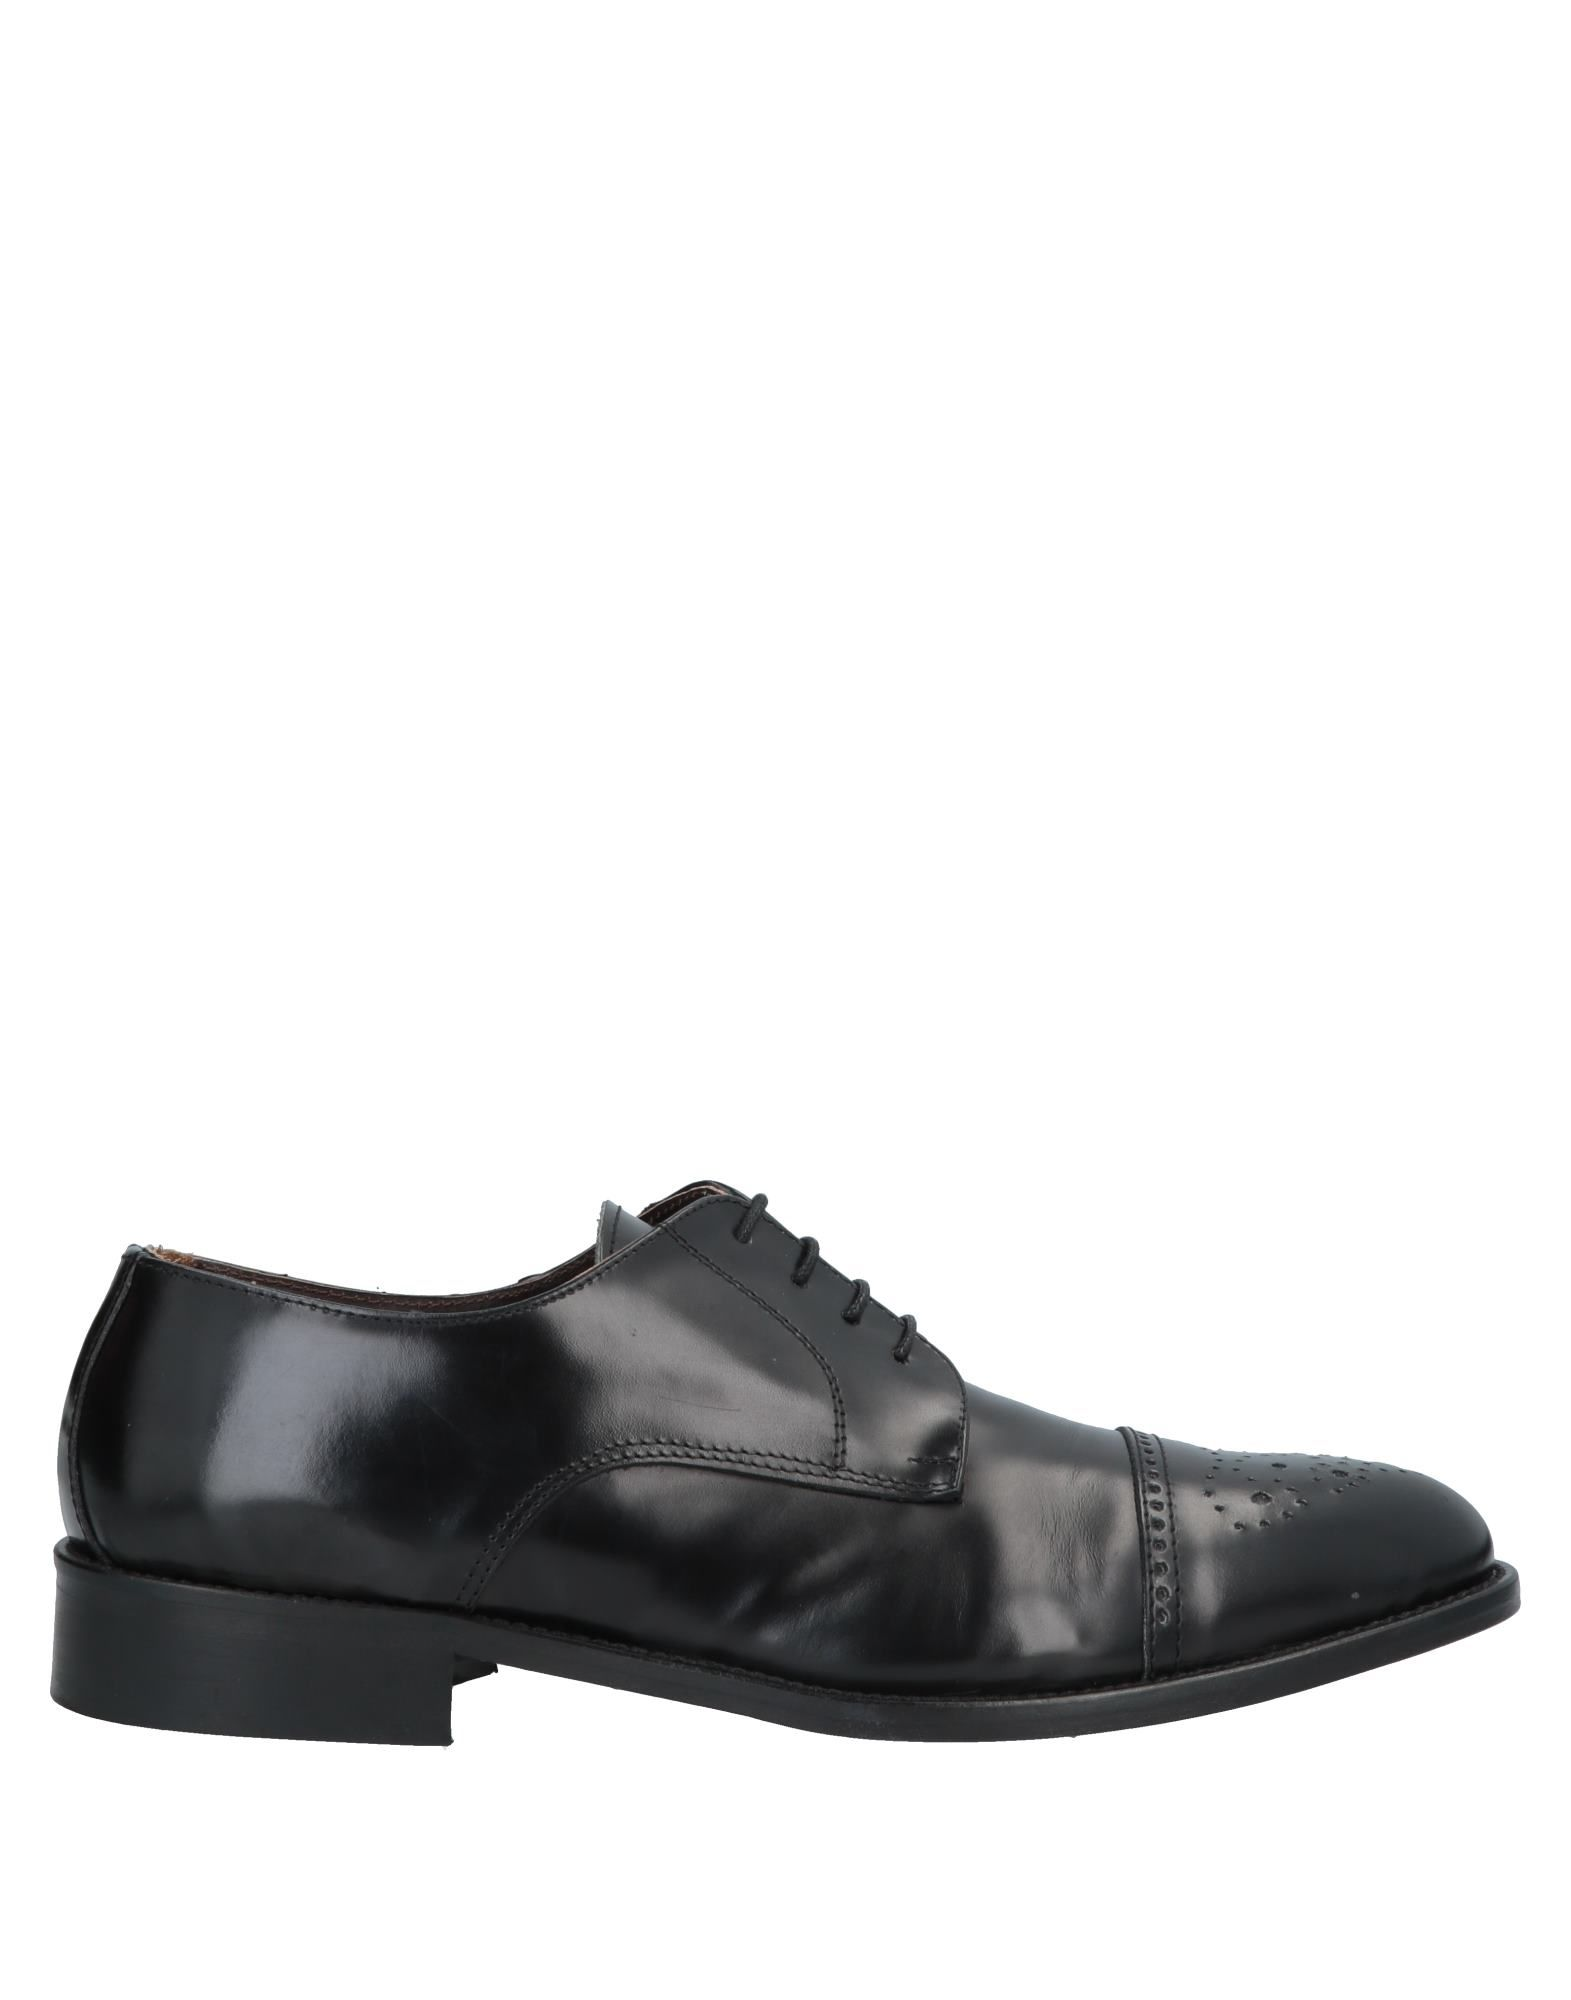 CRISTIANO ROSSANI® Обувь на шнурках cristiano rossani® мокасины